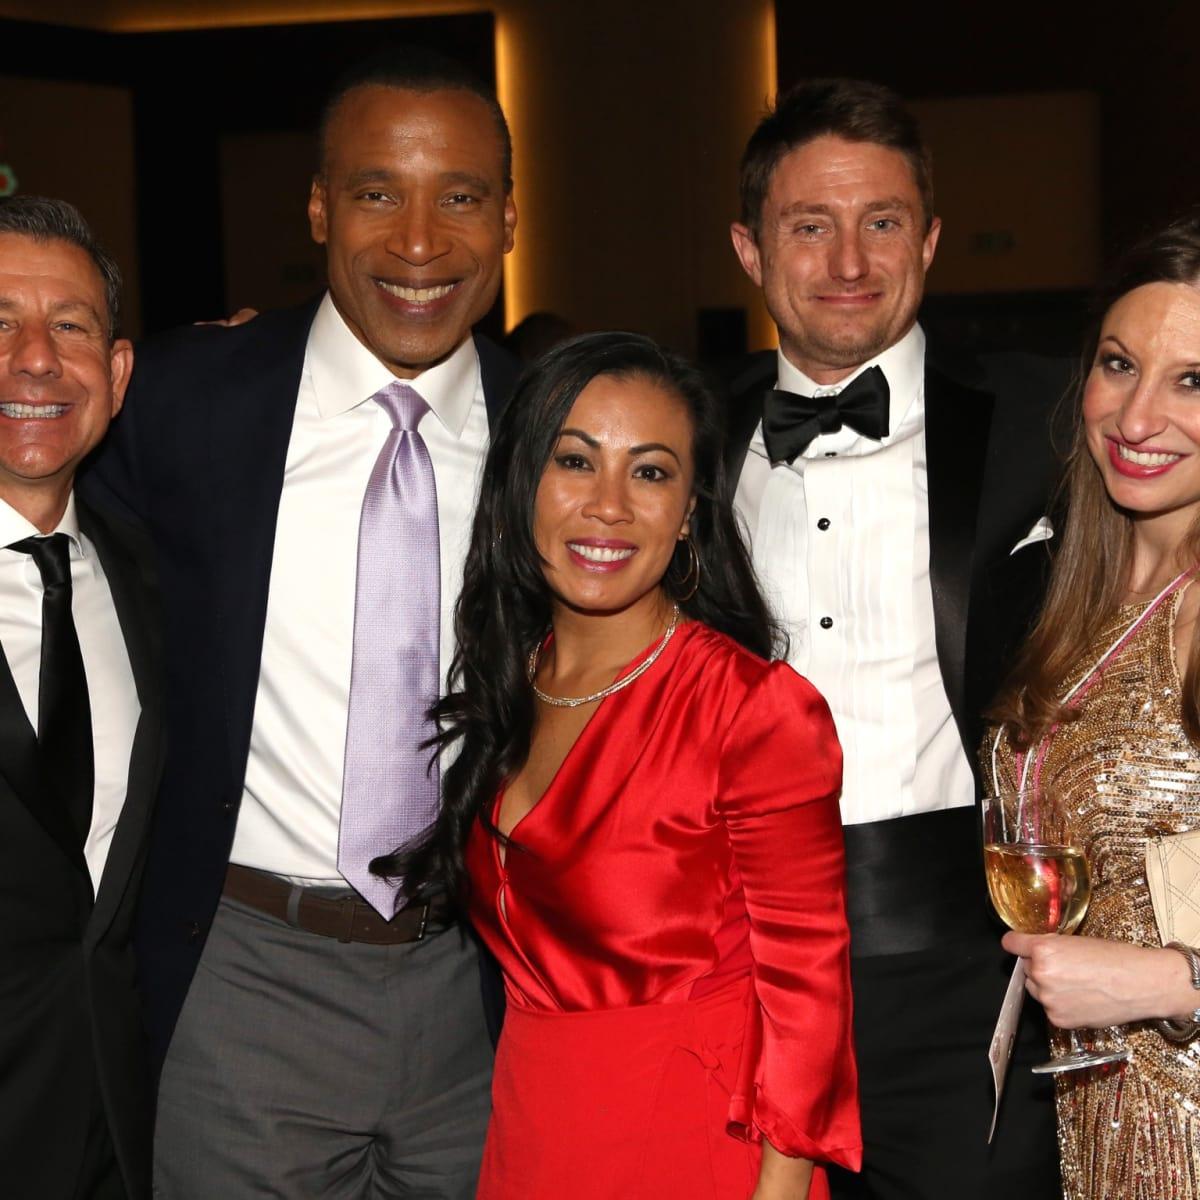 Brian Franco, Len Cannon, Chau Nguyen, Chris Smith, Laura Thompson at Houston Area Women's Center Gala